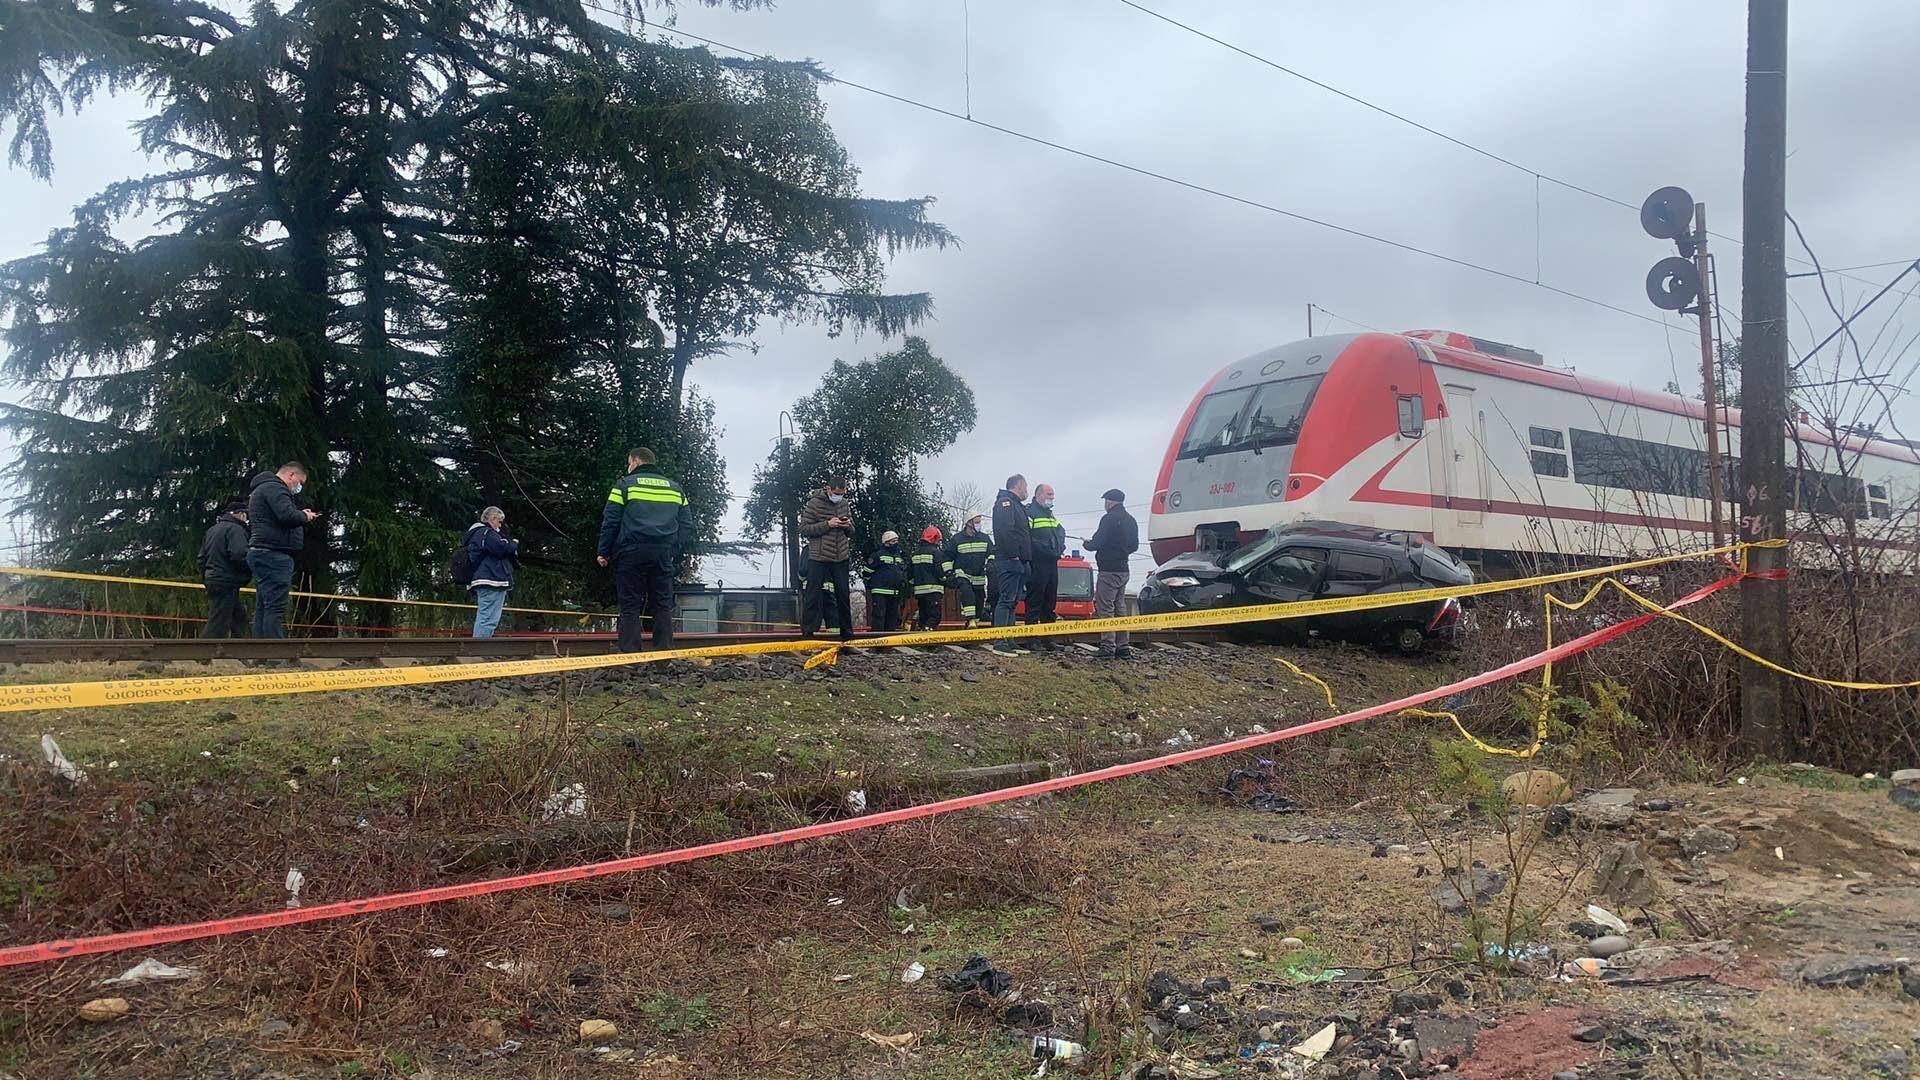 164075346 1251042801980350 2439989753444510834 n #новости авария, Грузия, Зугдиди, пассажирский поезд